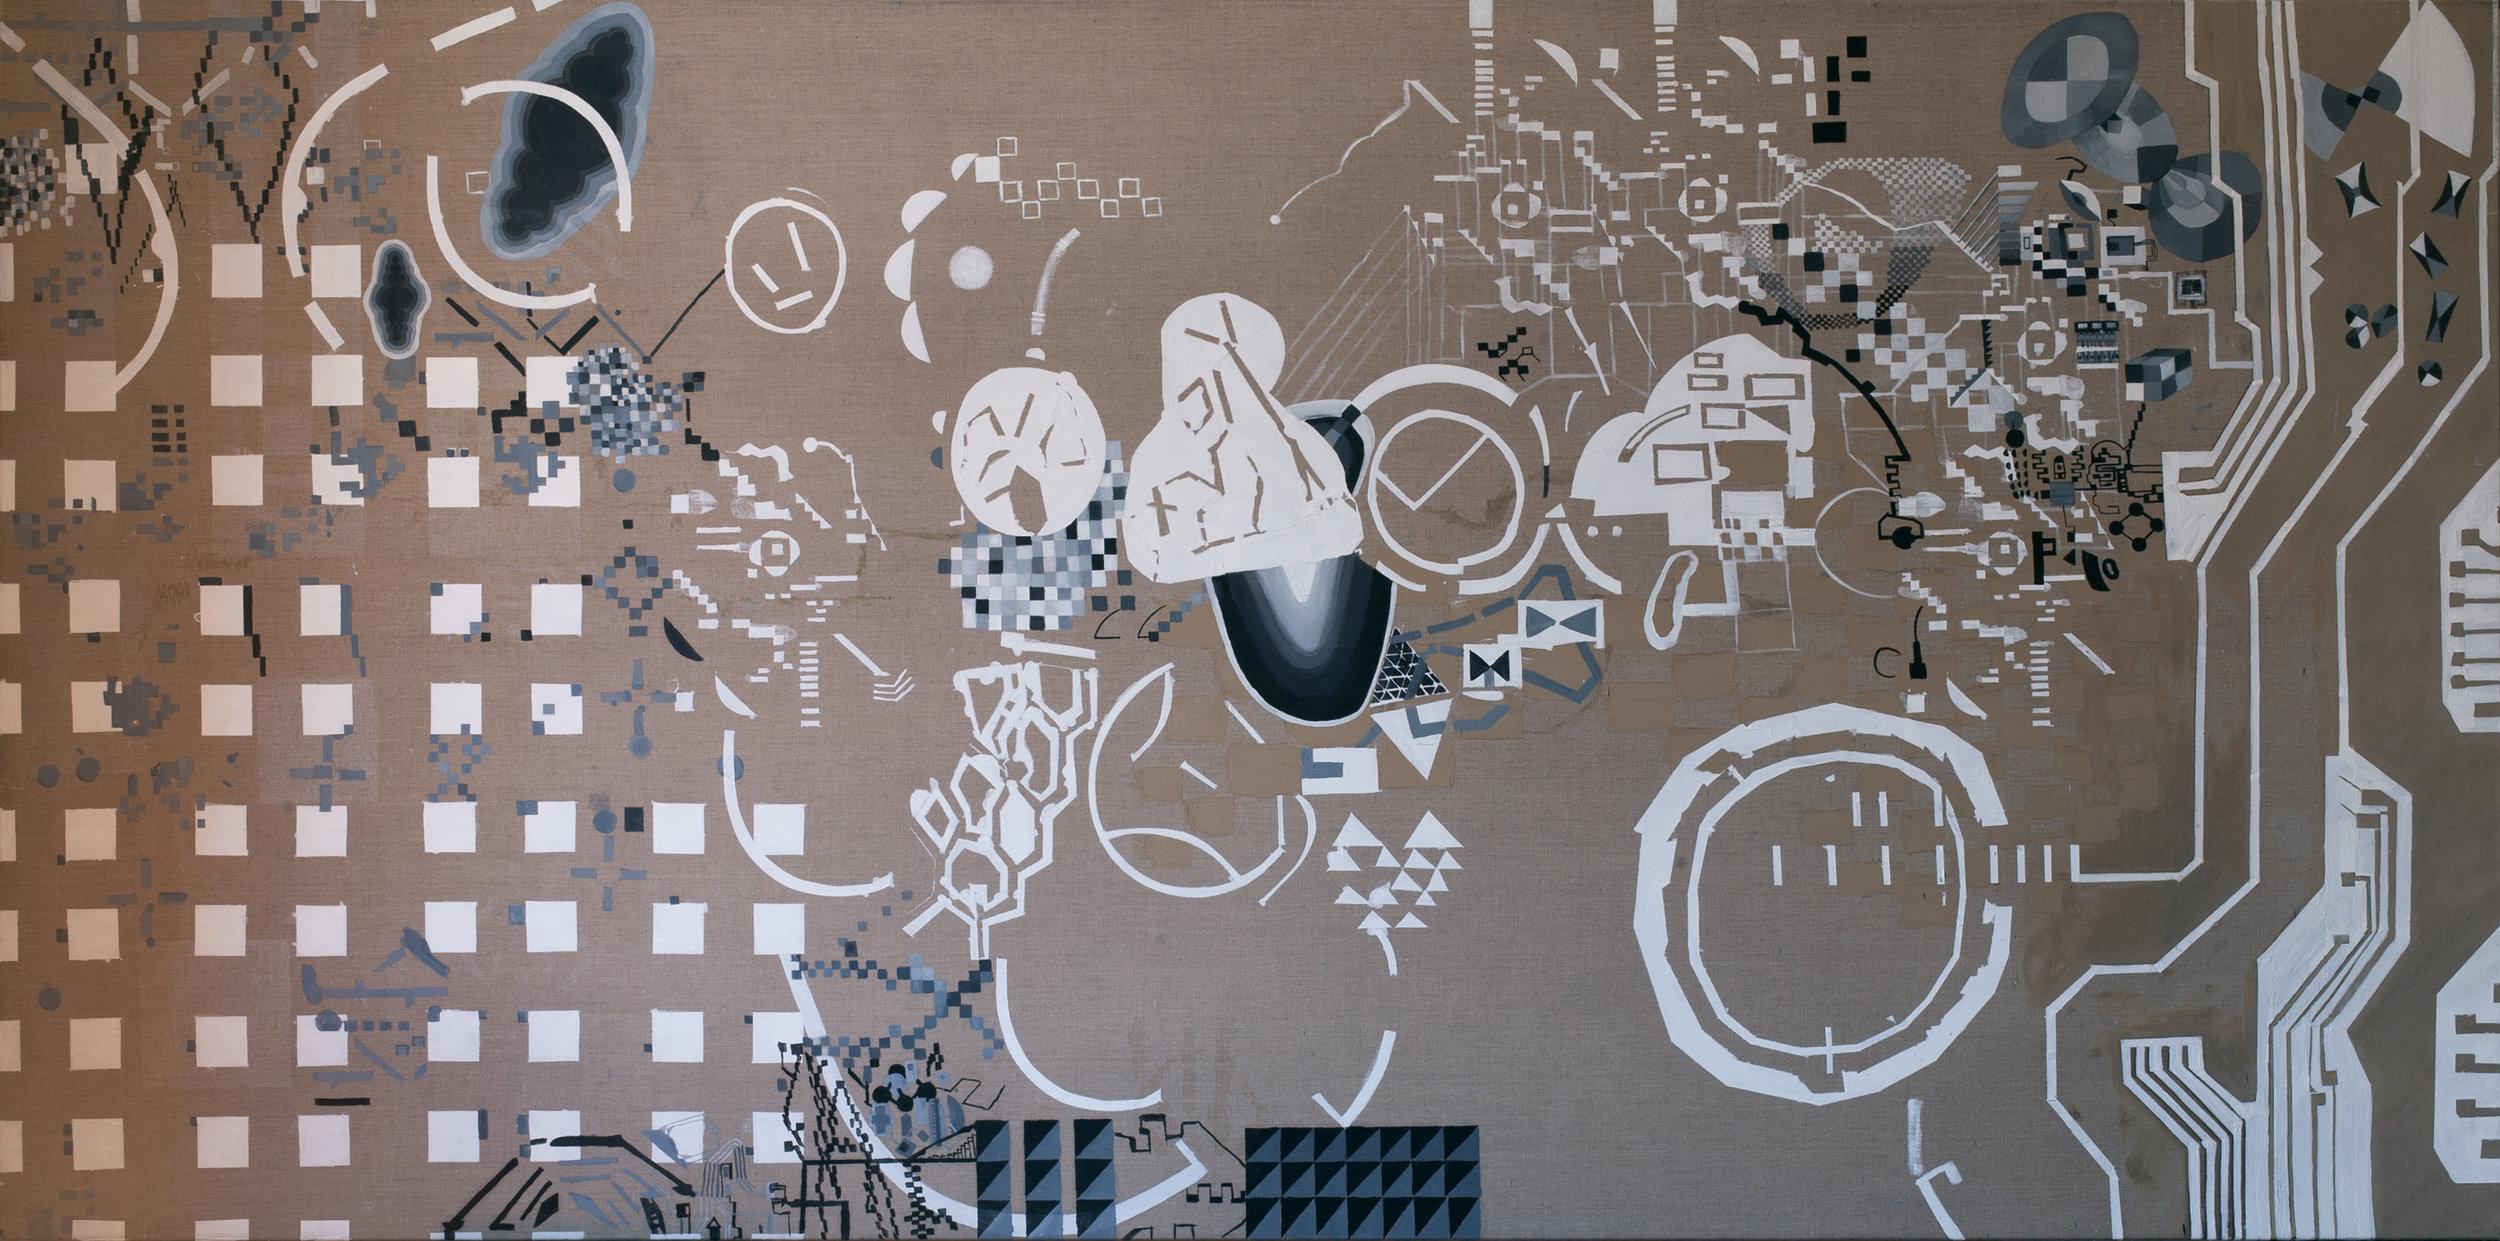 A.I Ok 2016 | Oil and egg tempera on linen | 150 x 300 cm